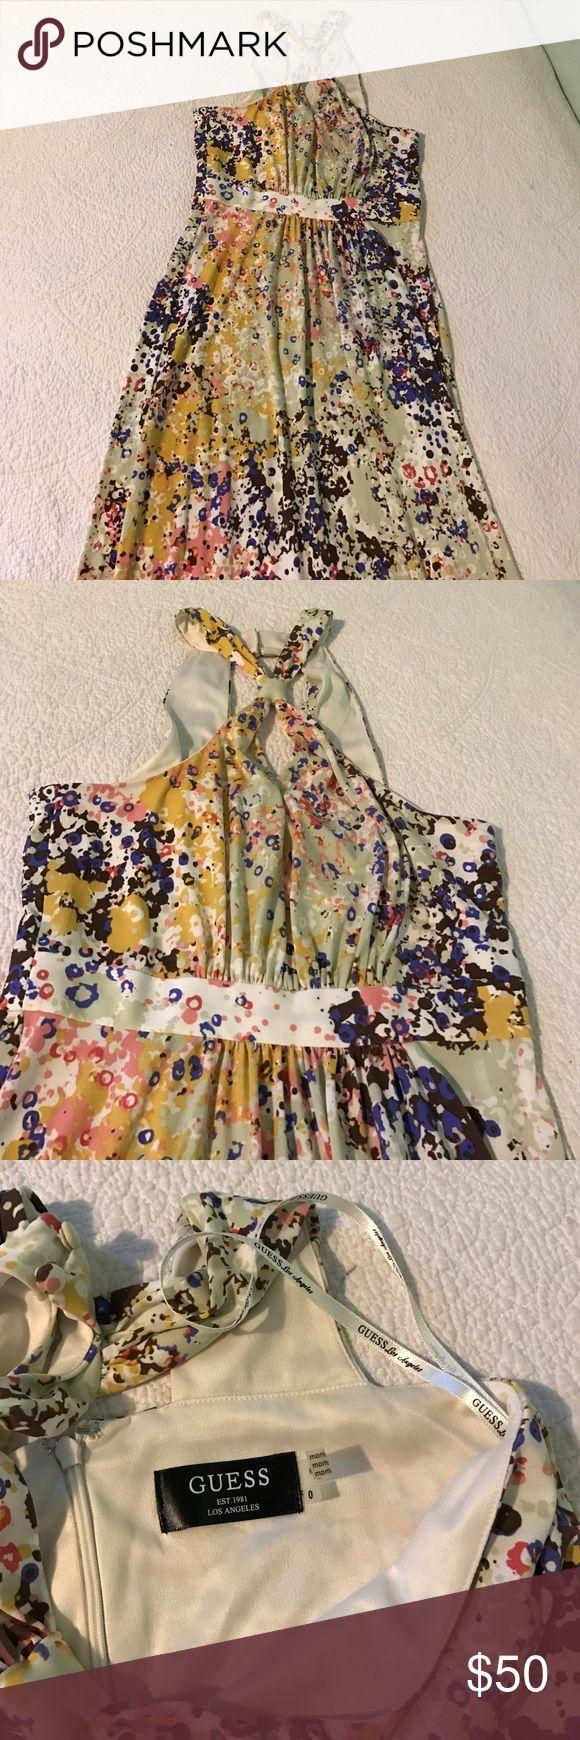 Beautiful print Guess dress Beautiful print guess long dress.  Size 0, worn only once. Guess Dresses